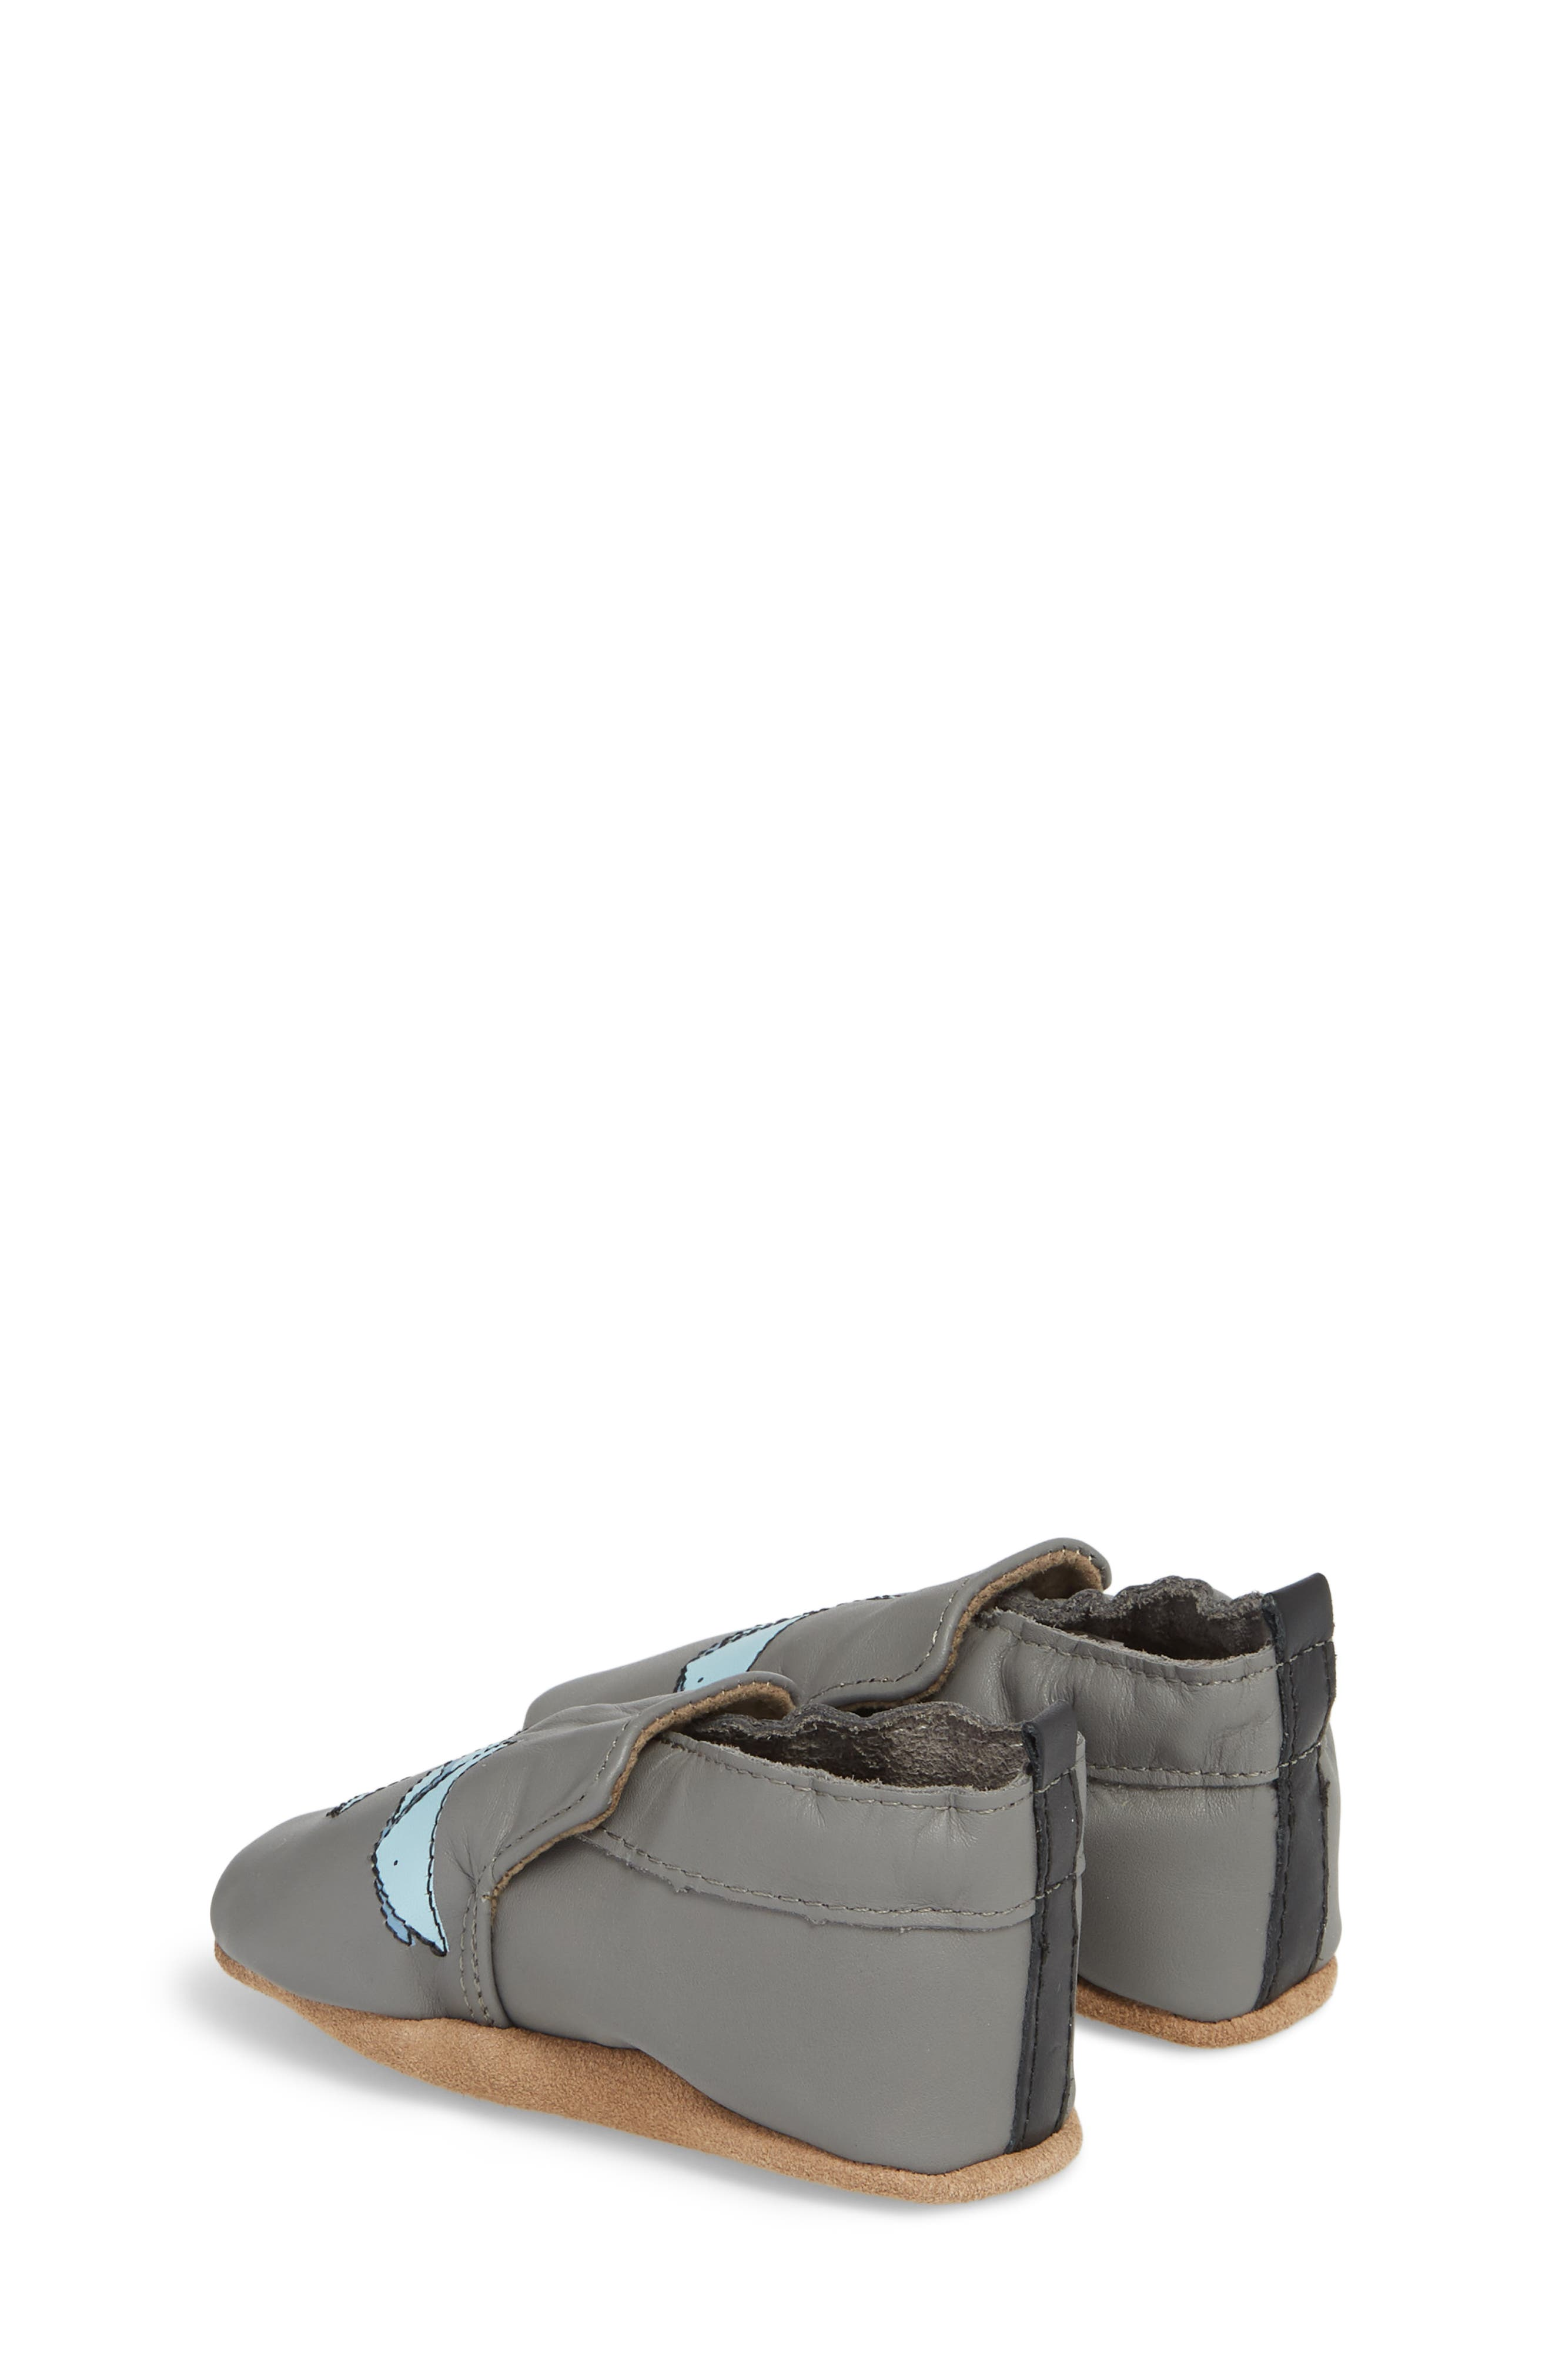 Sharktastic Moccasin Crib Shoe,                             Alternate thumbnail 2, color,                             Grey